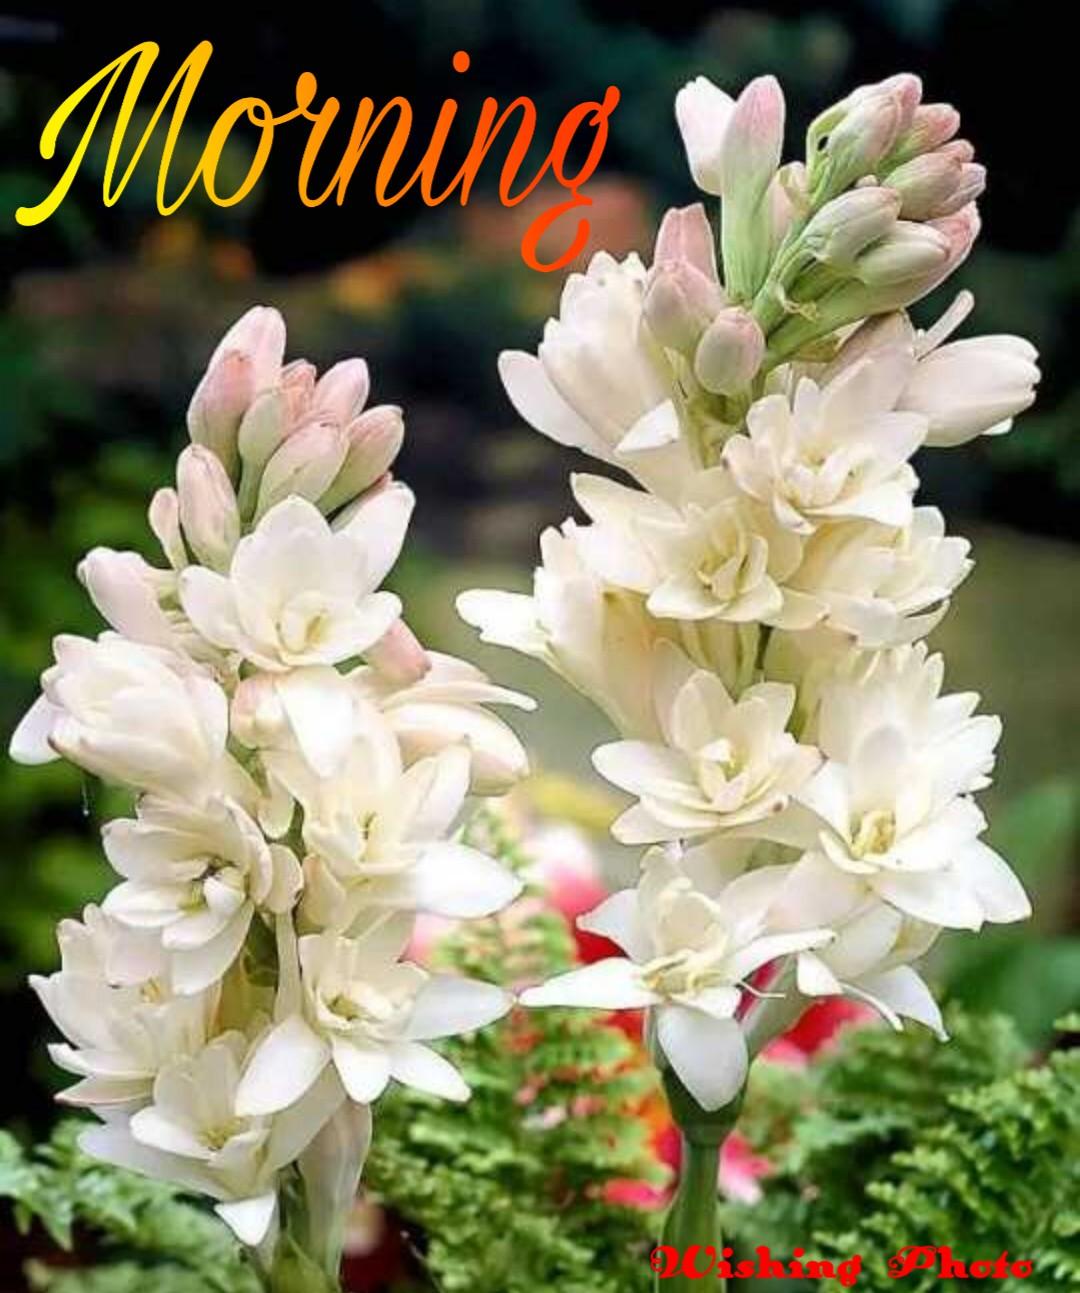 New 631 +good Morning Image || Good Morning Images Quotes || Good Morning Image For Love || Good Morning Image Download || Good Morning Images For Whatsapp